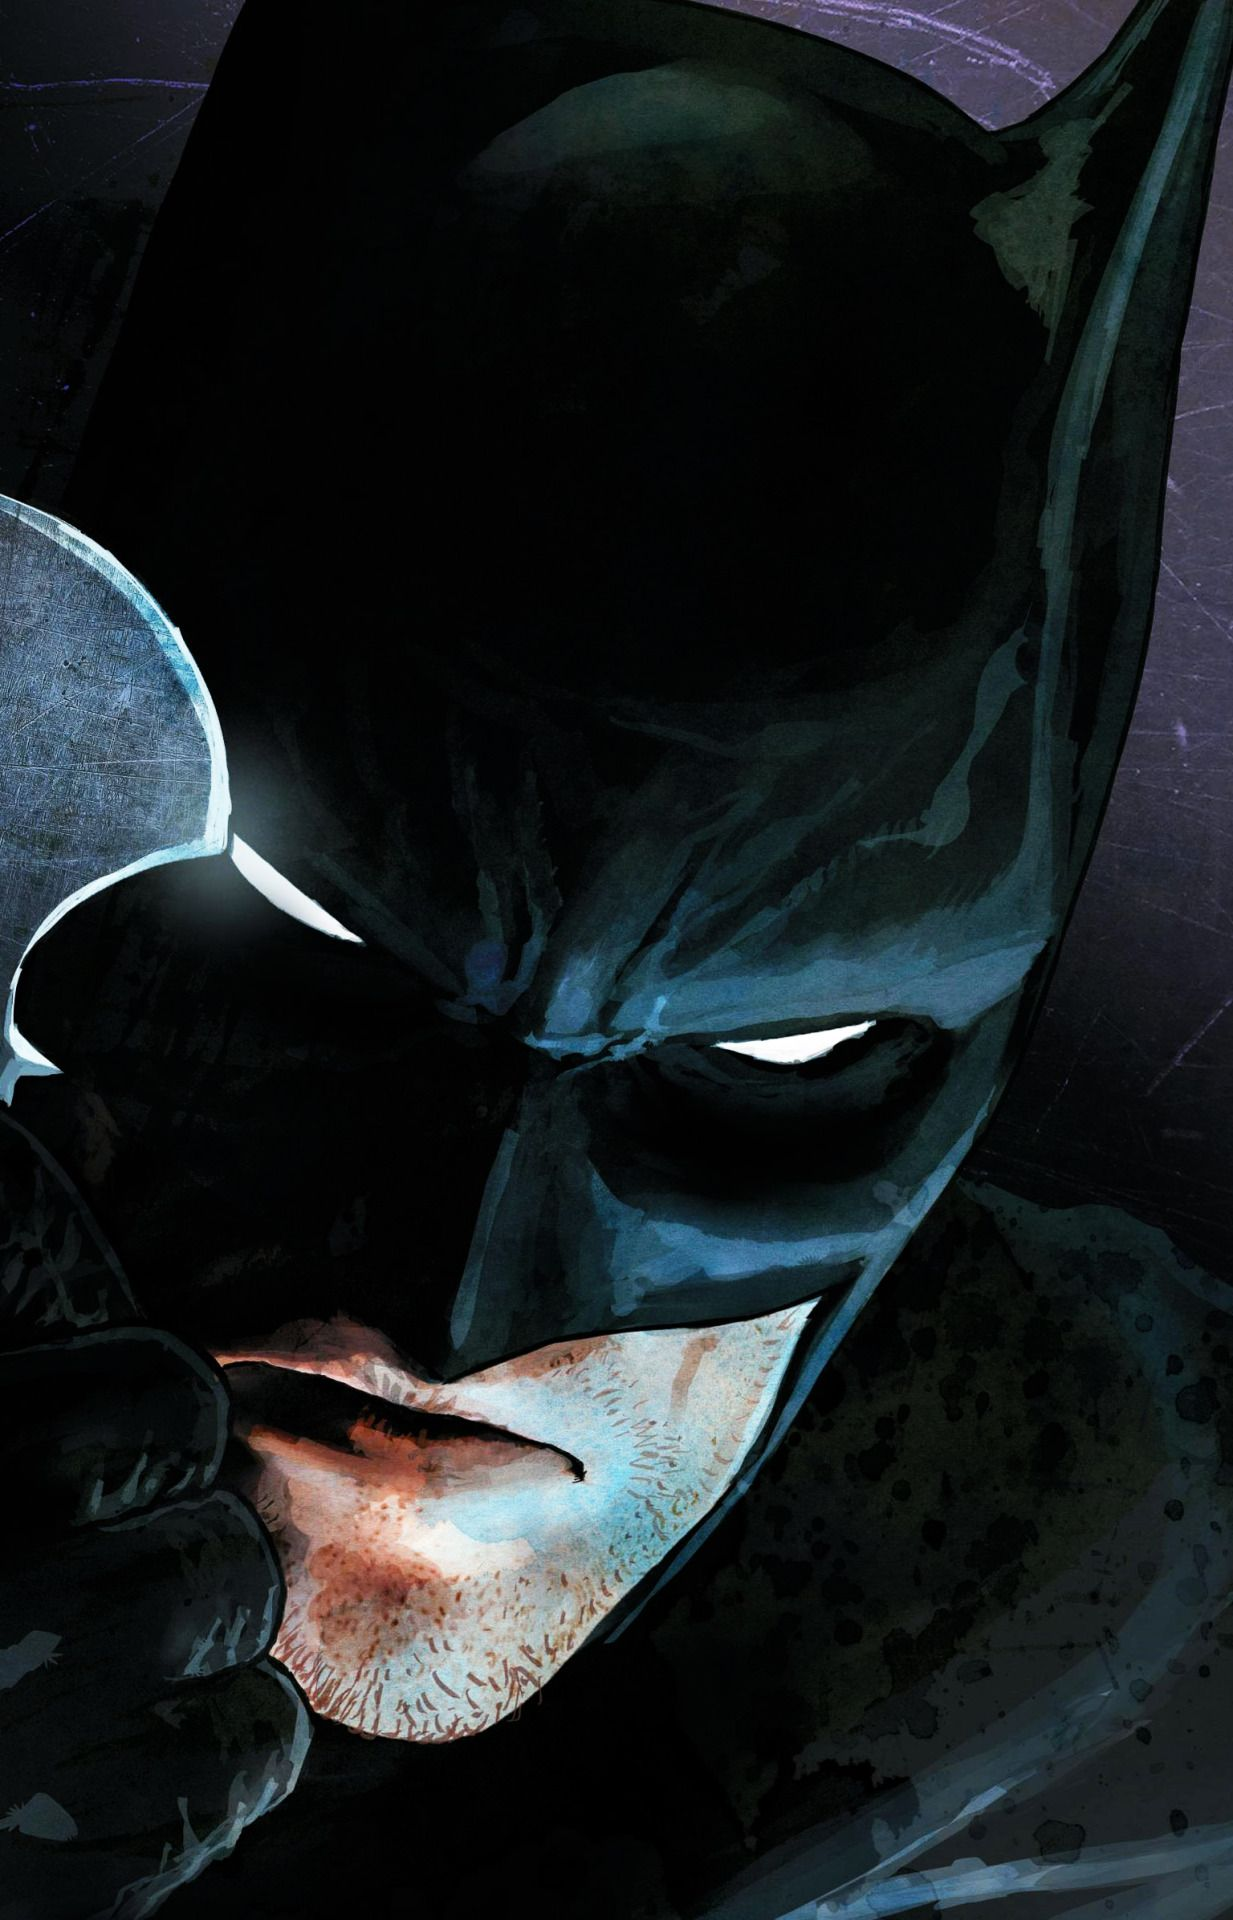 Wallpaper iphone superhero - Black Batman Superhero Logo Abstract Apple Wallpaper Iphone